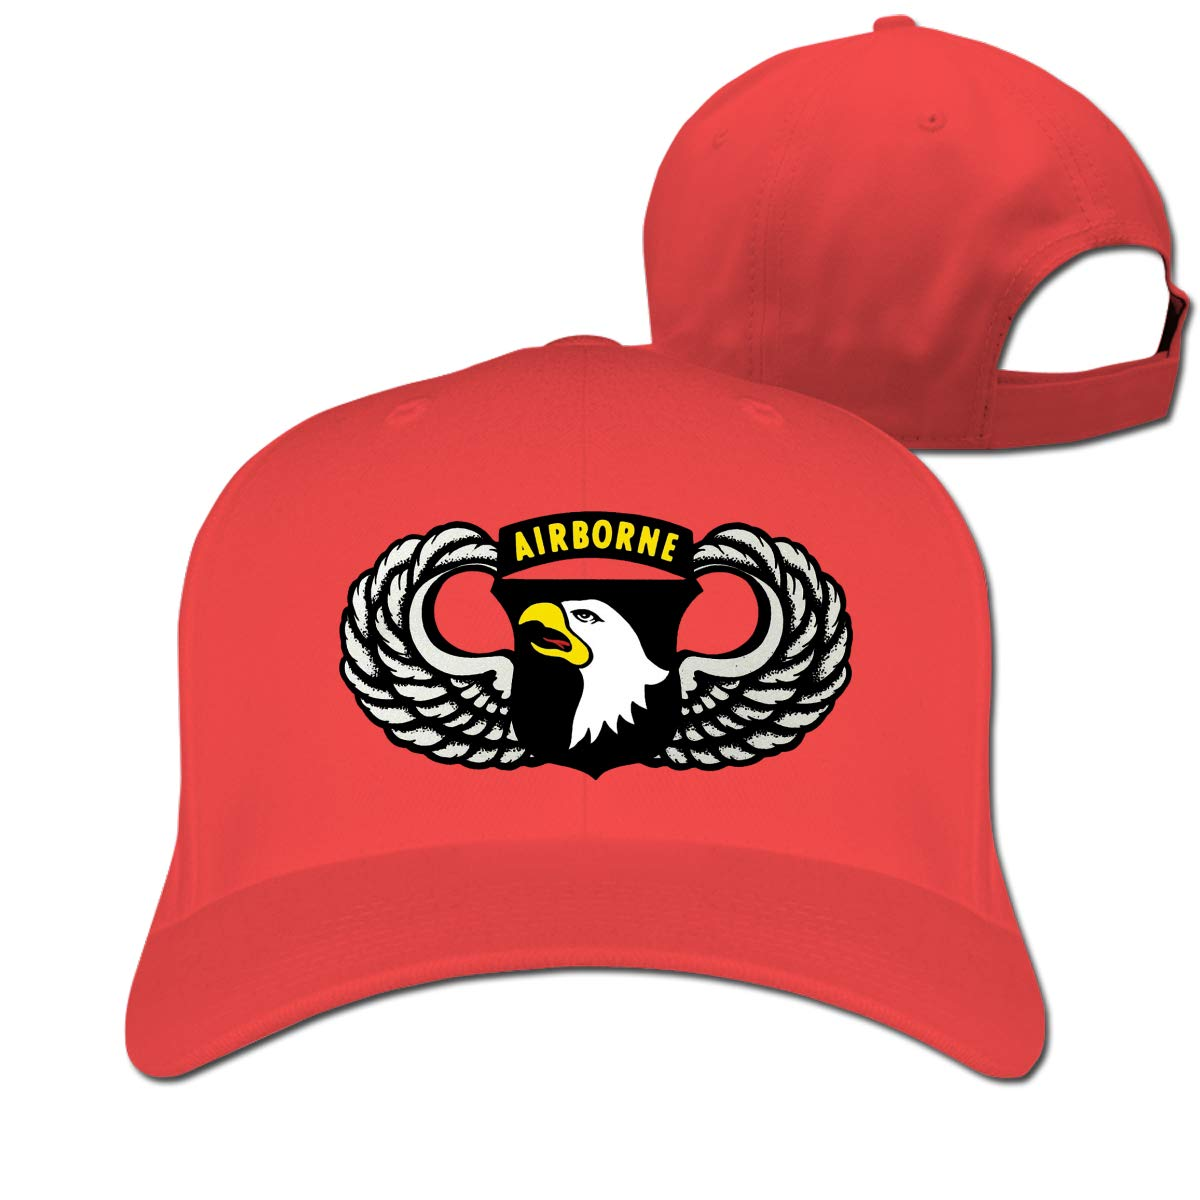 Vintage 101th Airborne Insignia Unisex Einstellbare Baseball Hut Sunbonnet Klar Hut Golf Hysterese Kappe